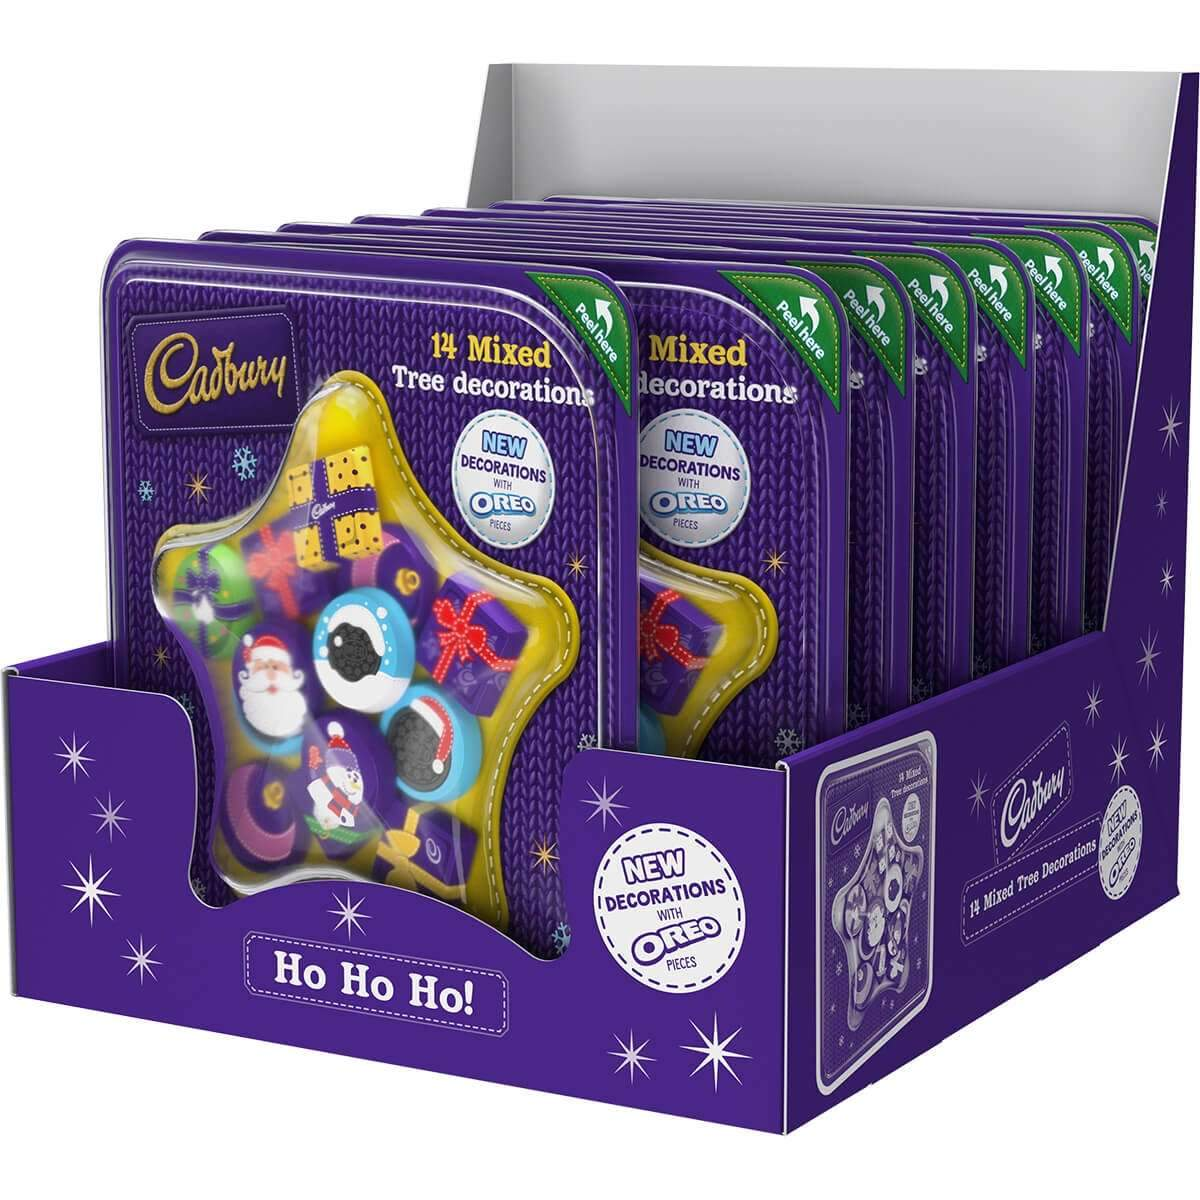 Cadbury Chocolate Tree Decorations 136g Box of 10